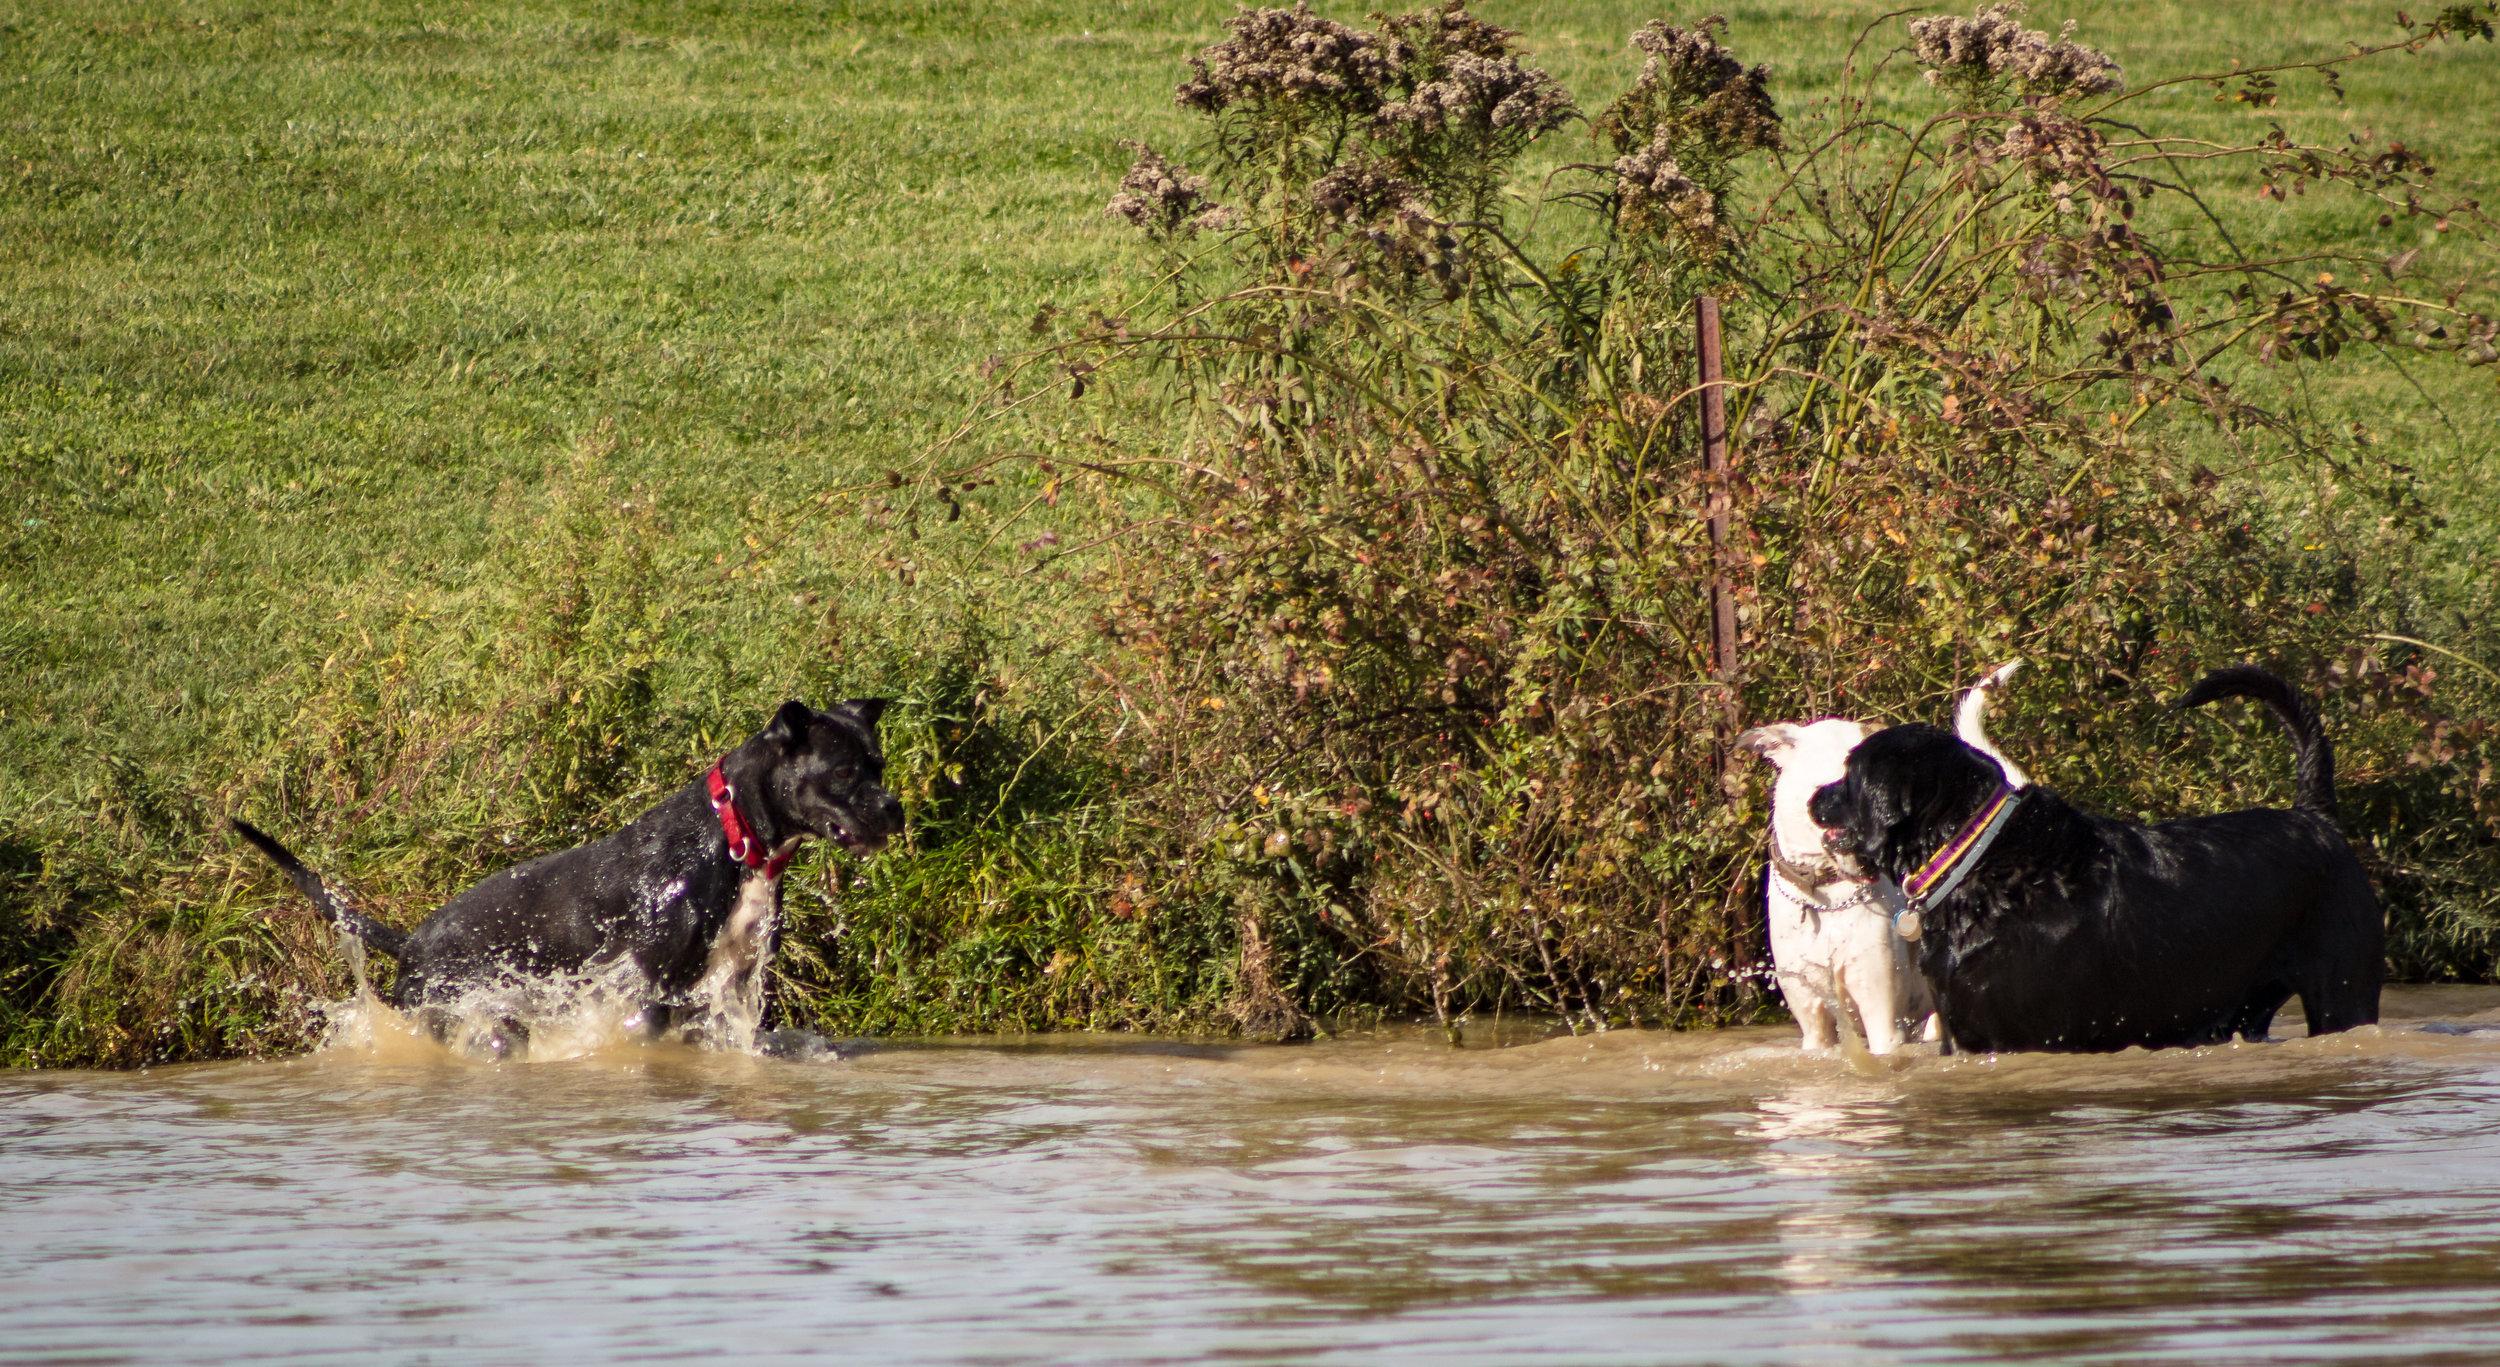 Dogs-15.jpg